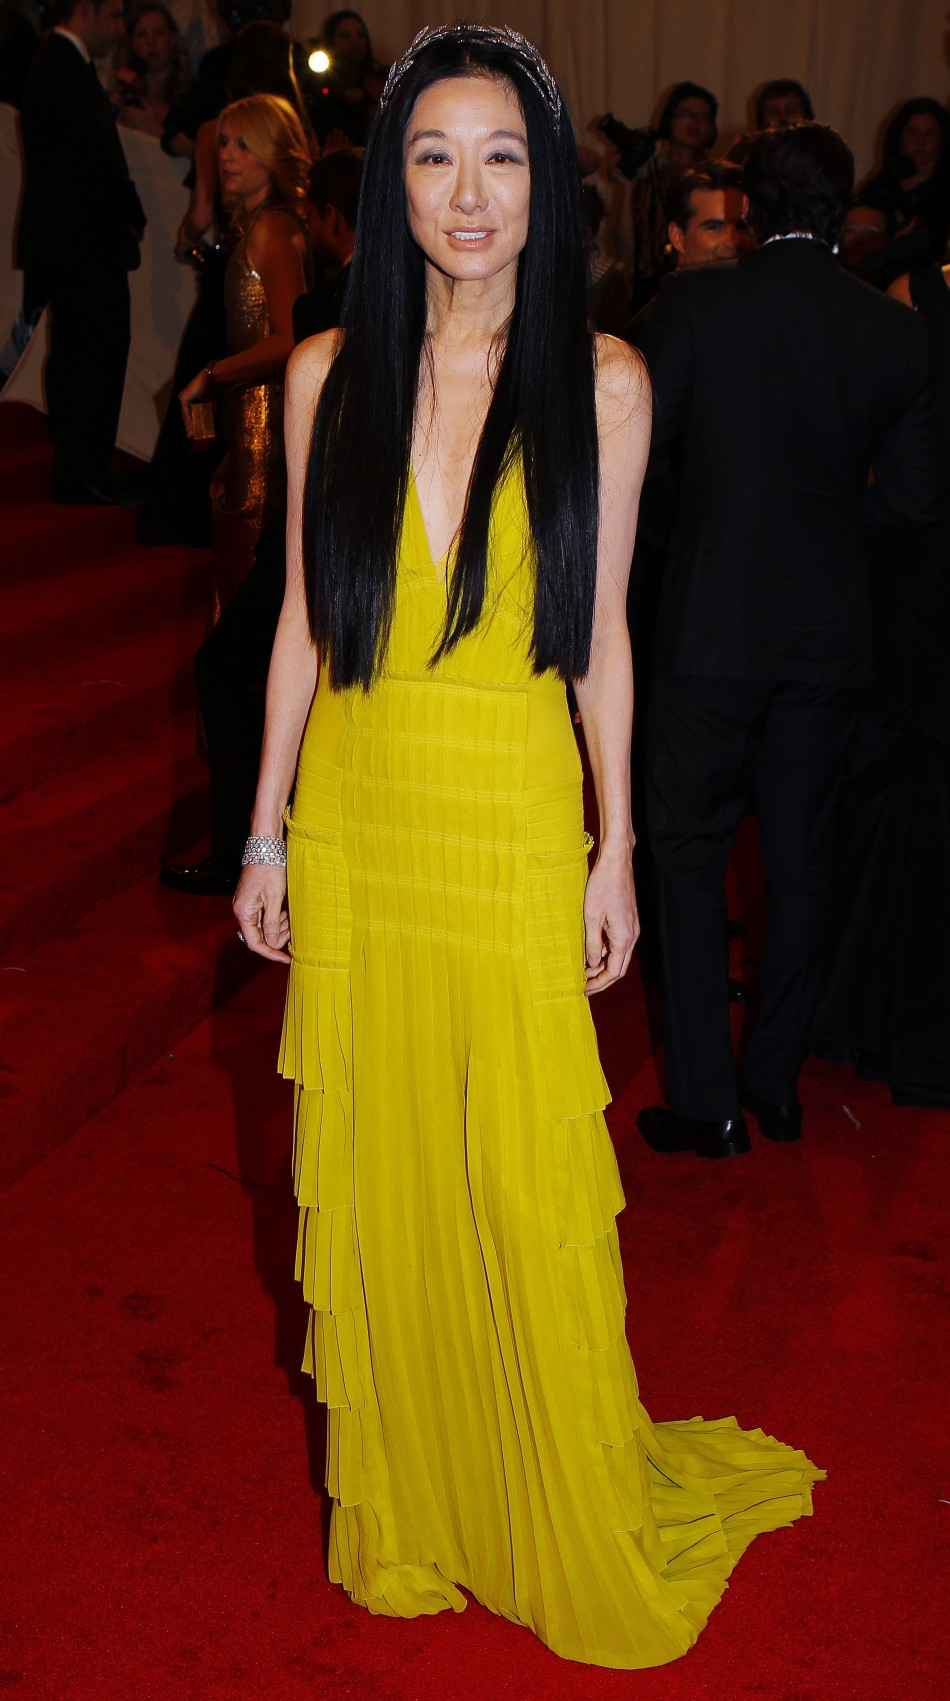 Designer Vera Wang Looks Stunning In Swimsuit Photoshoot